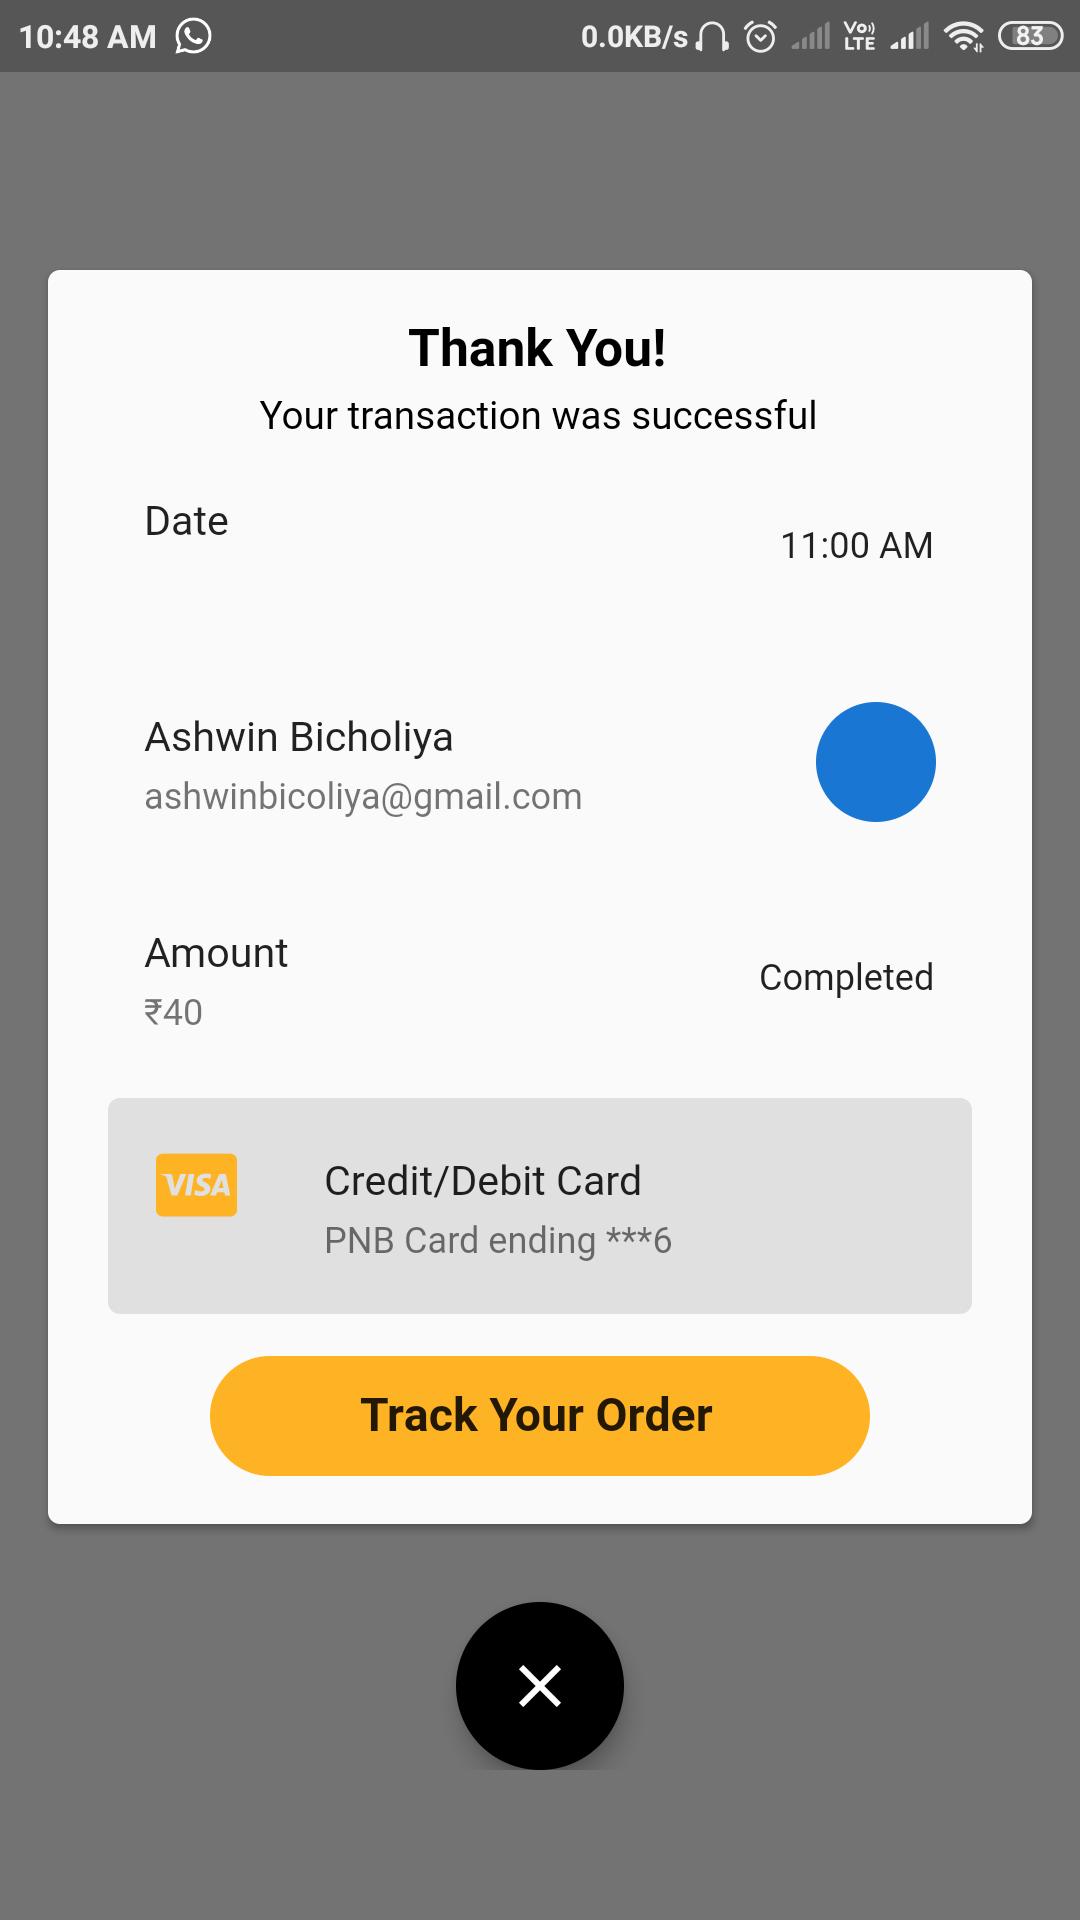 Screenshot_2019-10-16-10-48-13-009_com example food_delivery